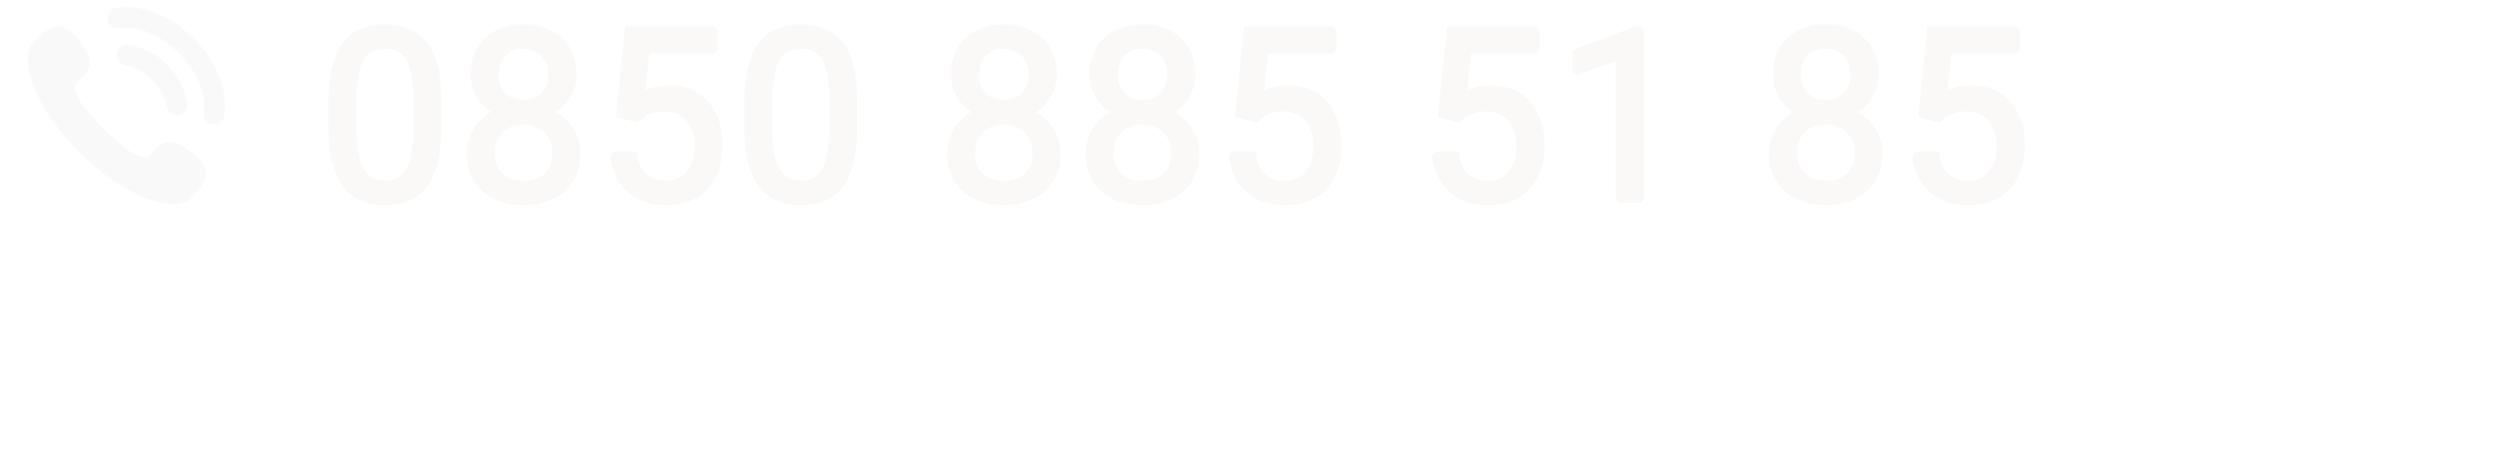 0850 885 51 85